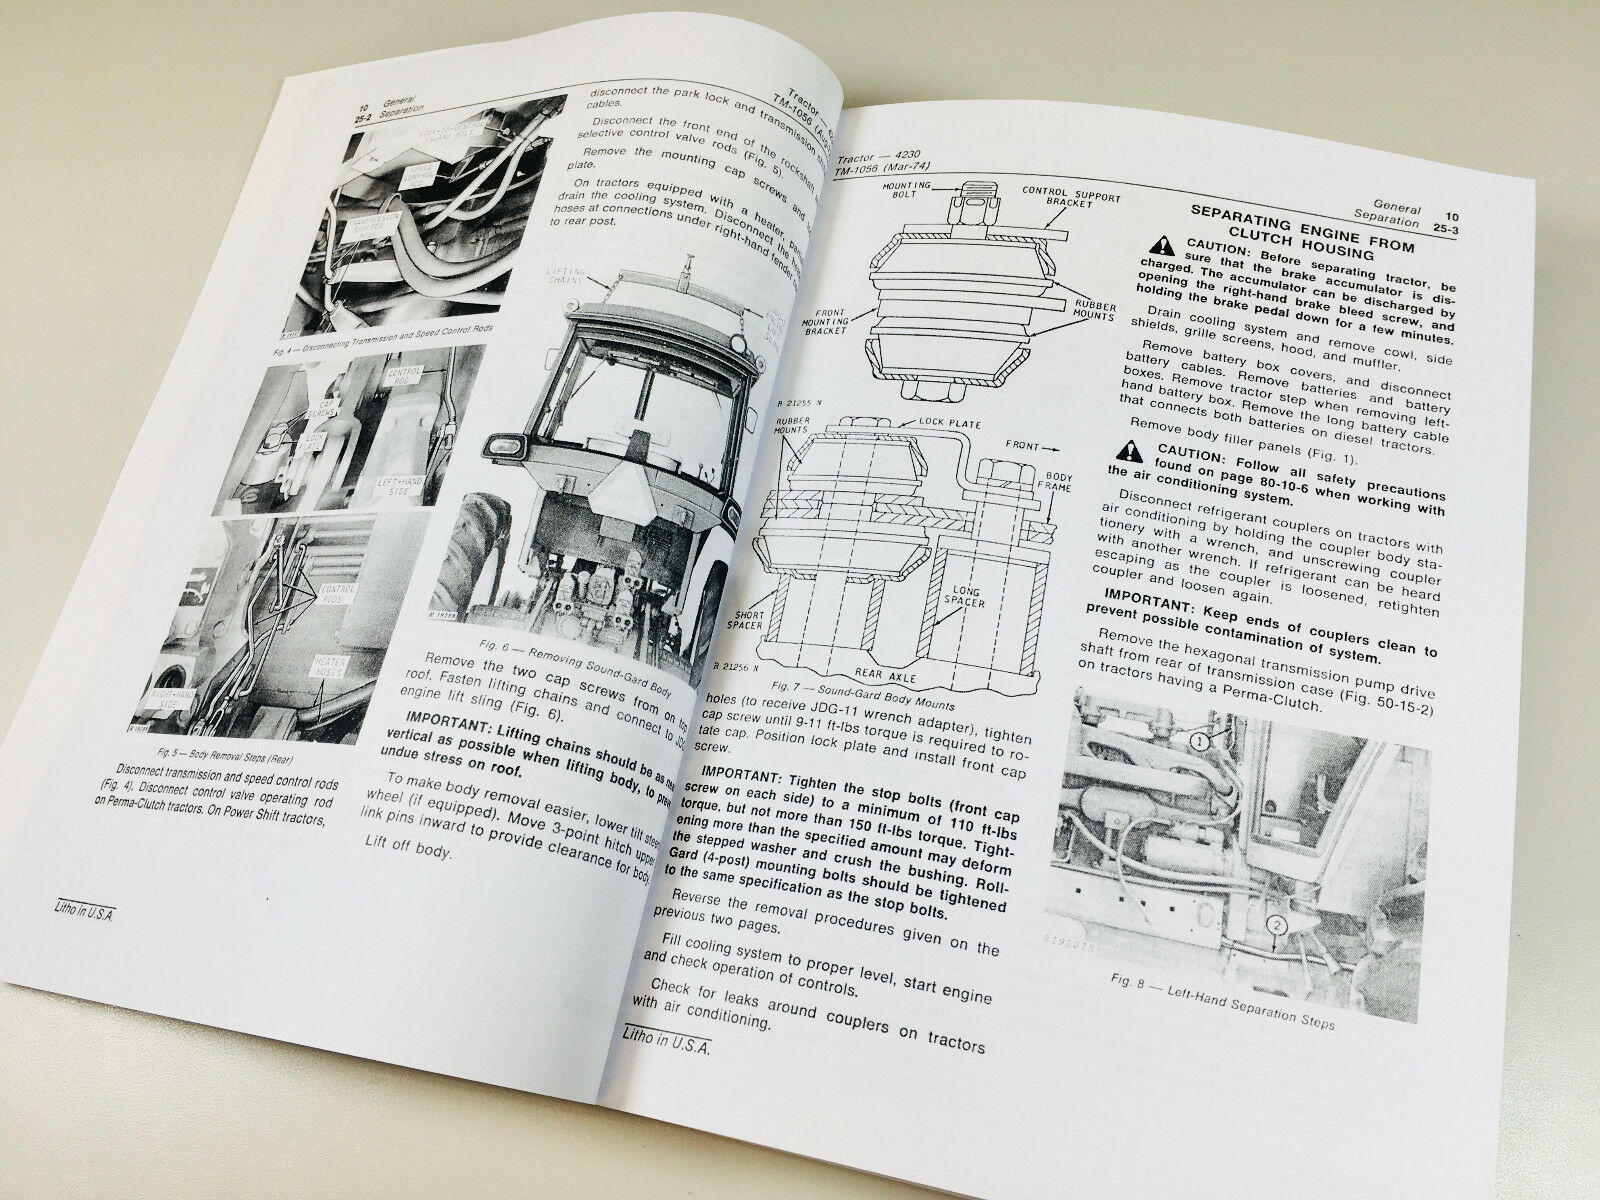 john deere 4230 service manual